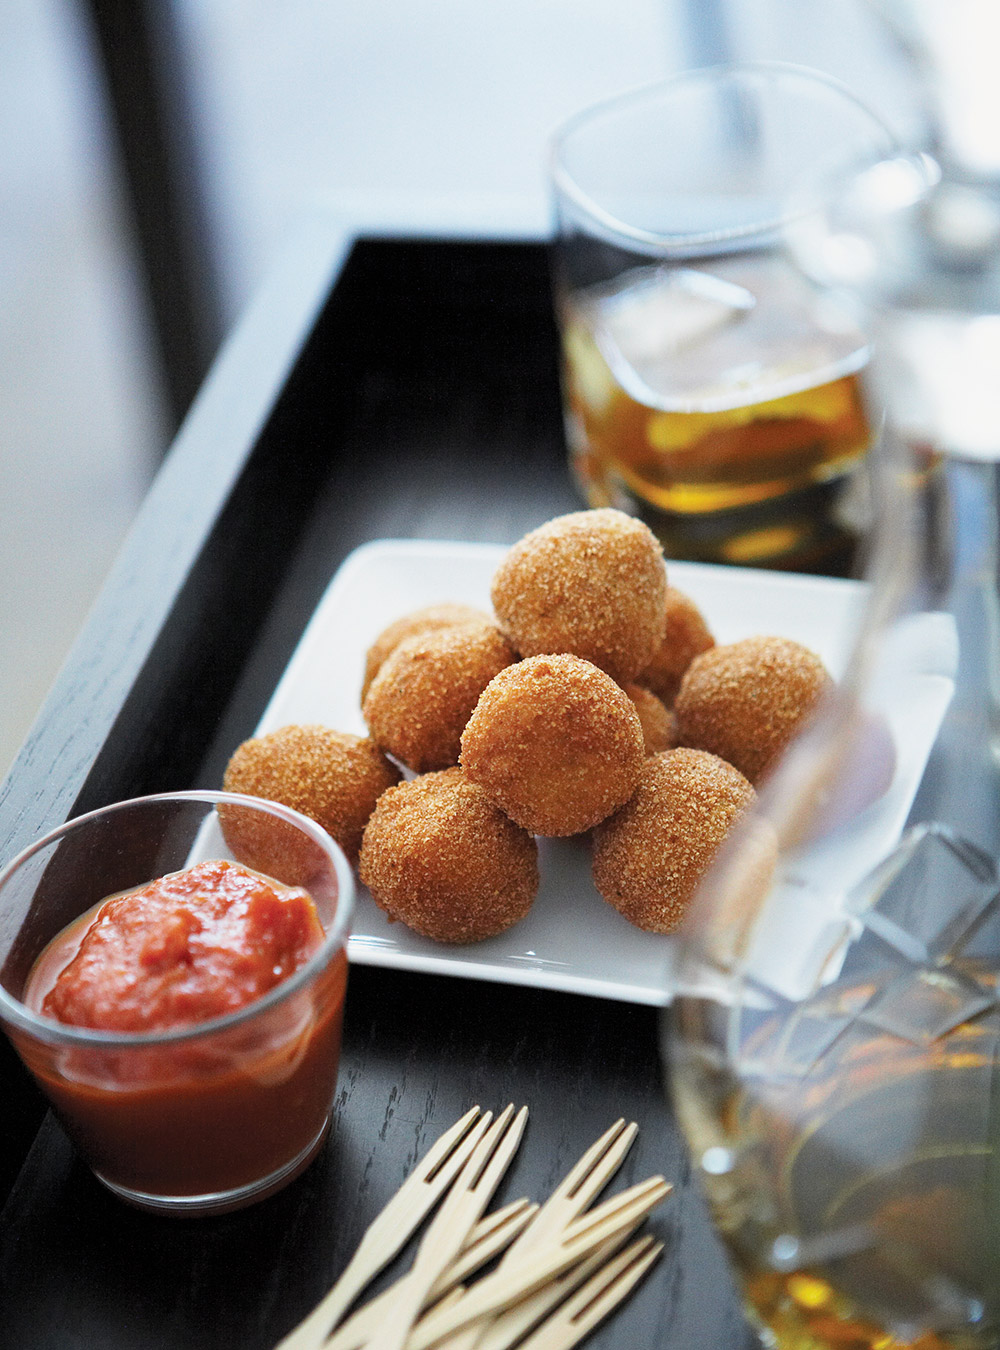 Arancini siciliens la cuisine italienne recette - Cuisine sicilienne arancini ...